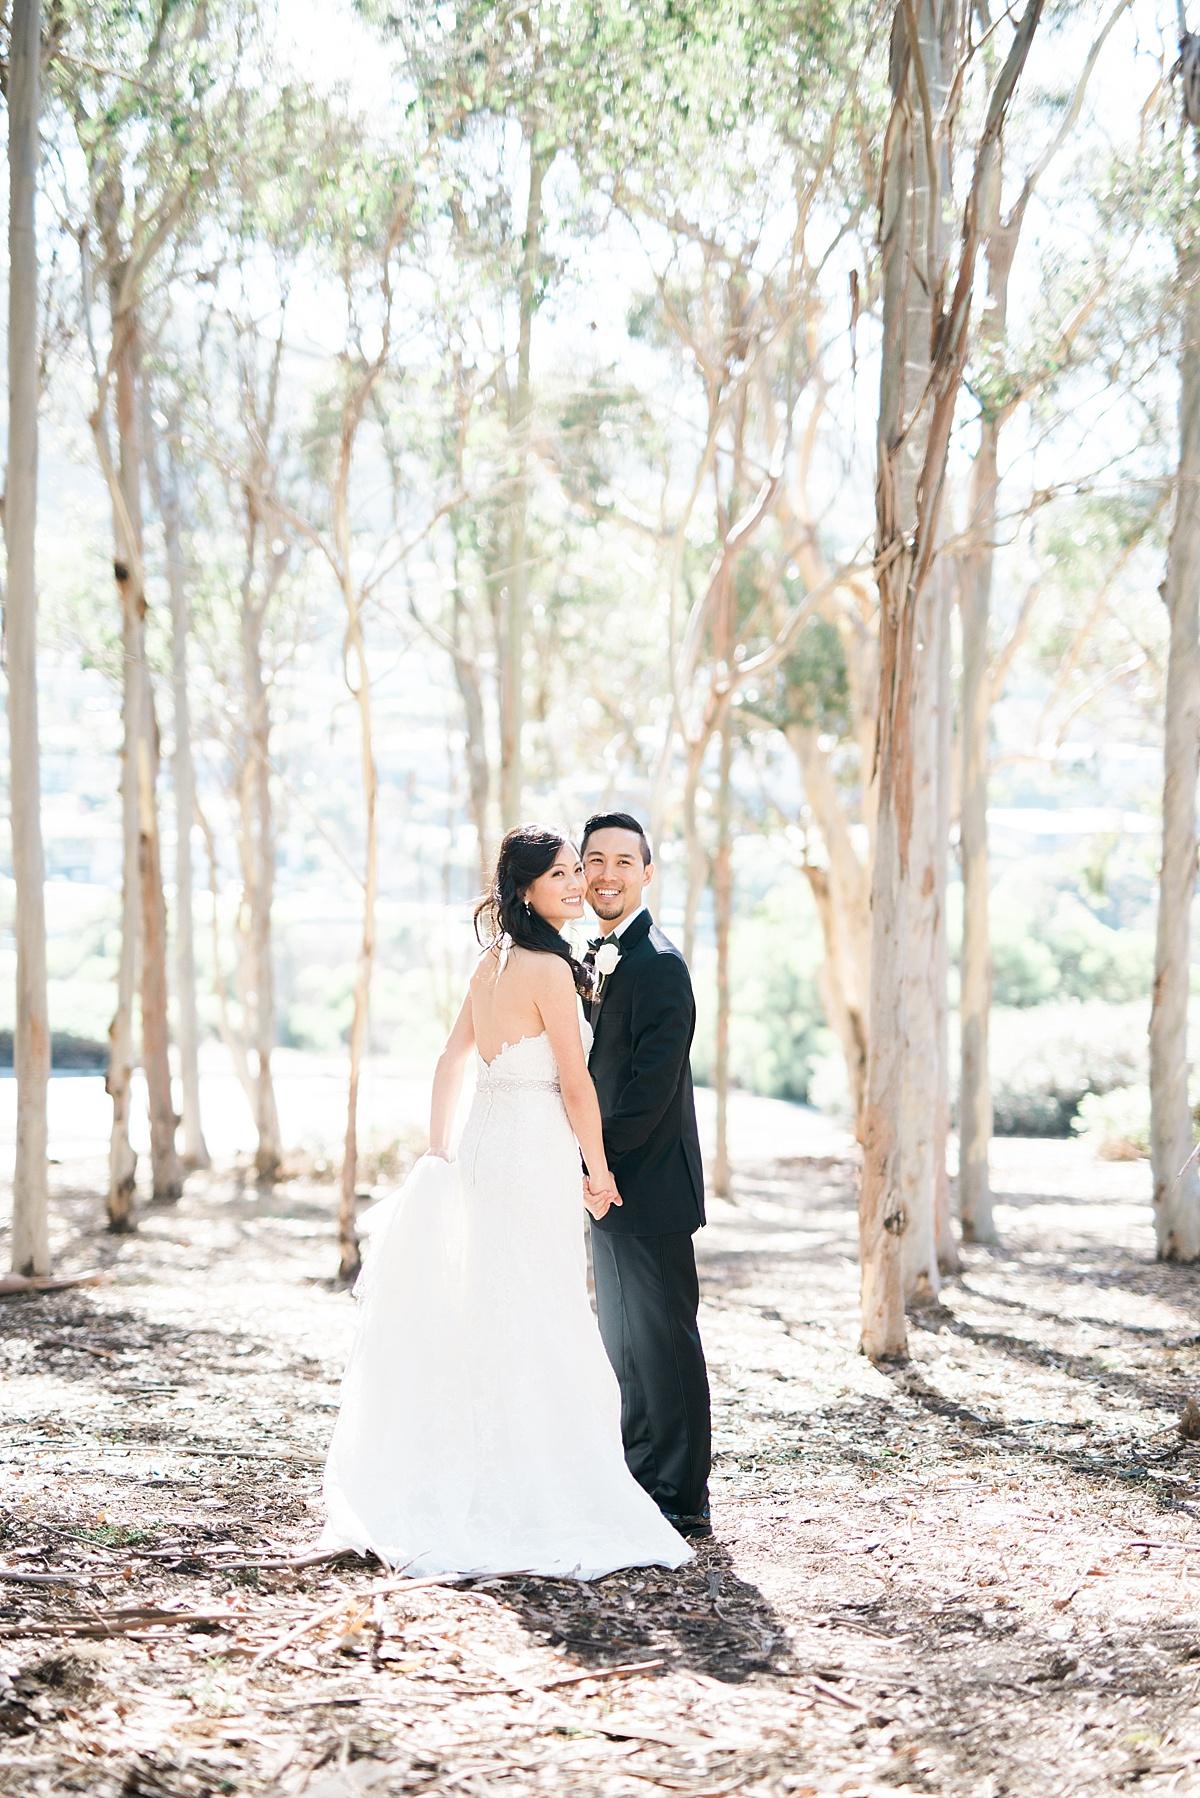 Double-Tree-San-Pedro-Wedding-Photographer-Krissy-Rich-Carissa-Woo-Photography_0037.jpg